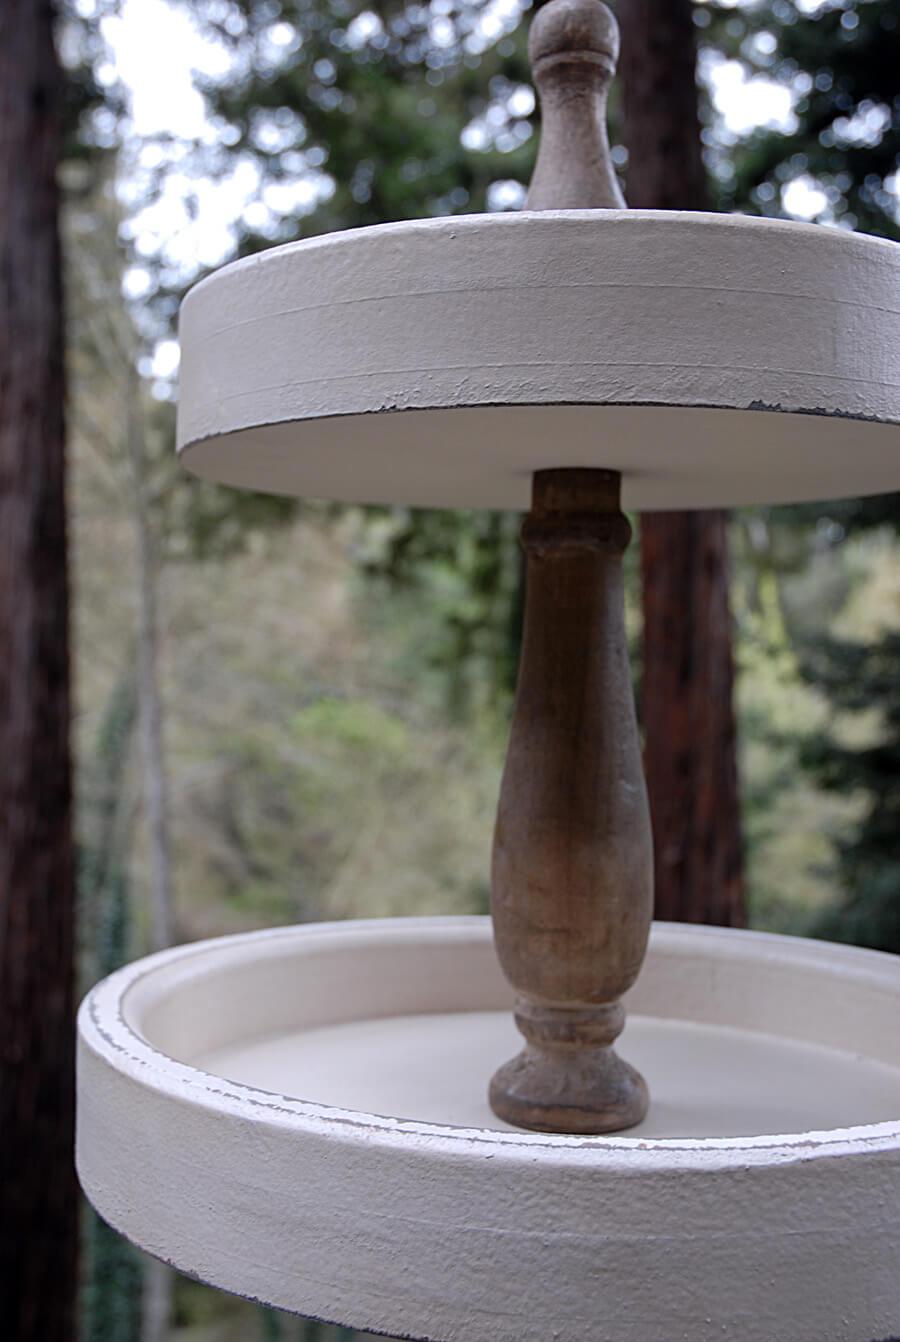 3 Tier Wood Dessert Stand